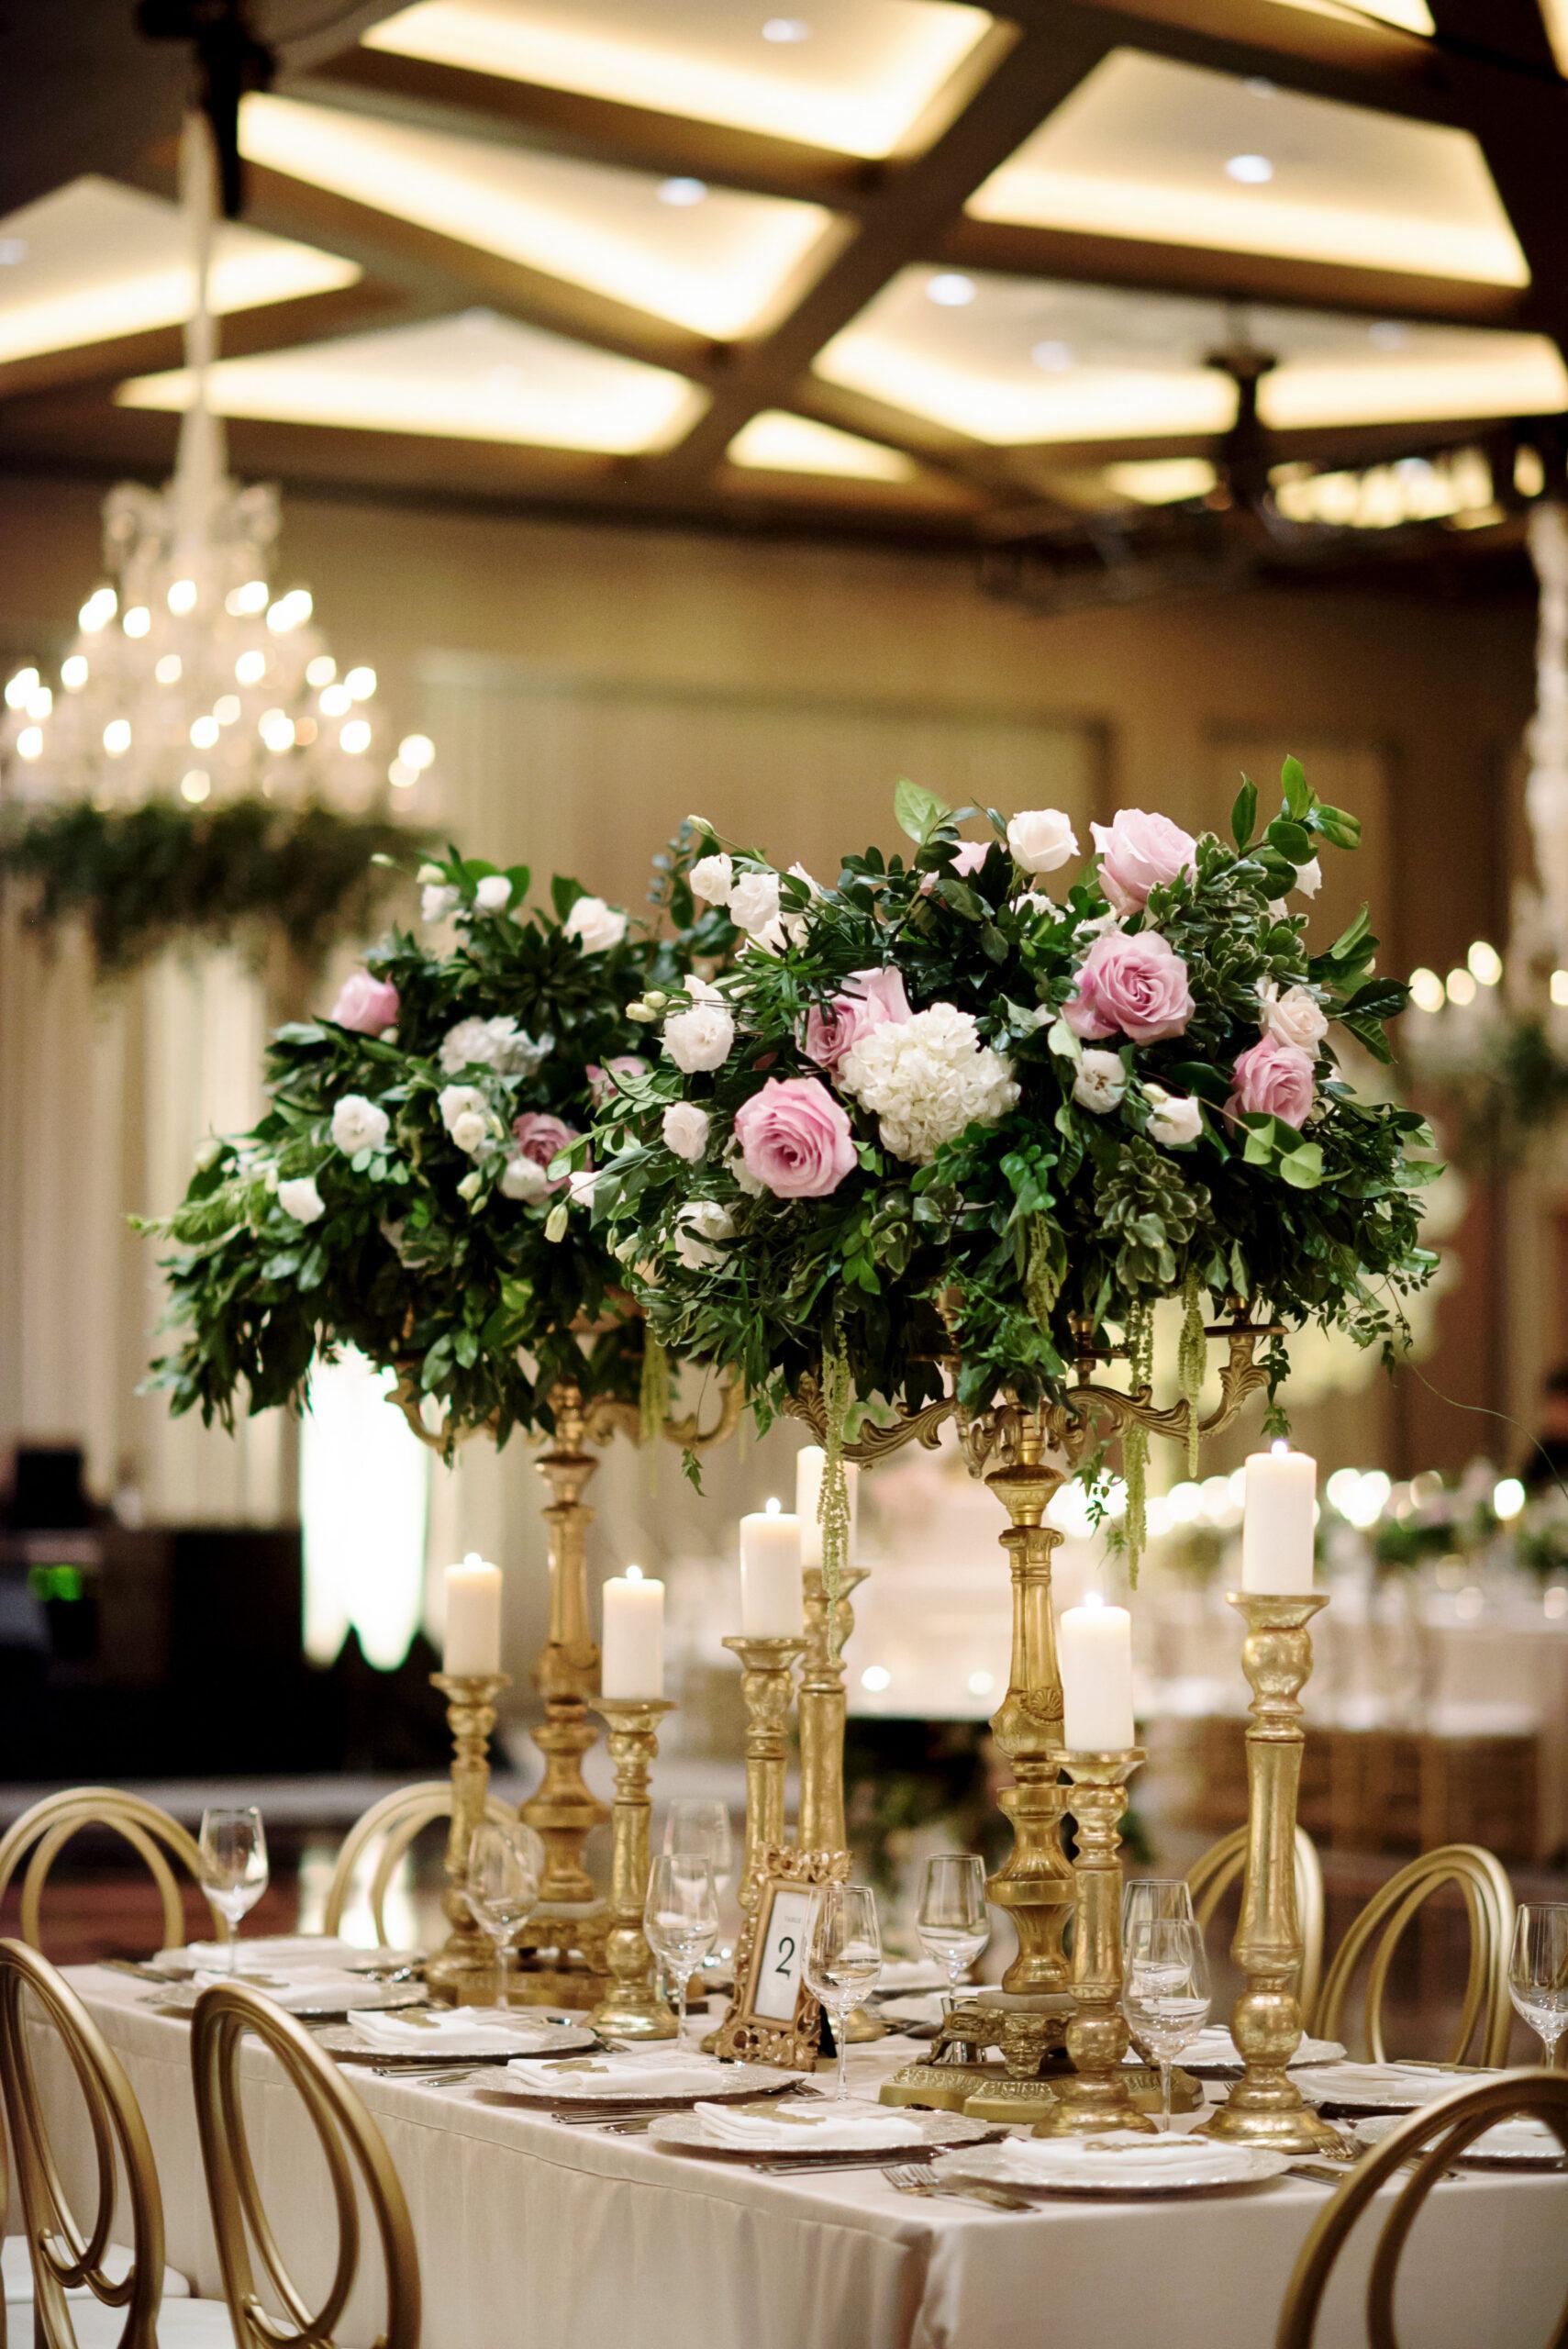 https://secureservercdn.net/45.40.145.151/kgq.ab5.myftpupload.com/wp-content/uploads/2020/04/Sanam-Soroush-s-Wedding-wedluxe-submission-0084-scaled.jpg?time=1600462602